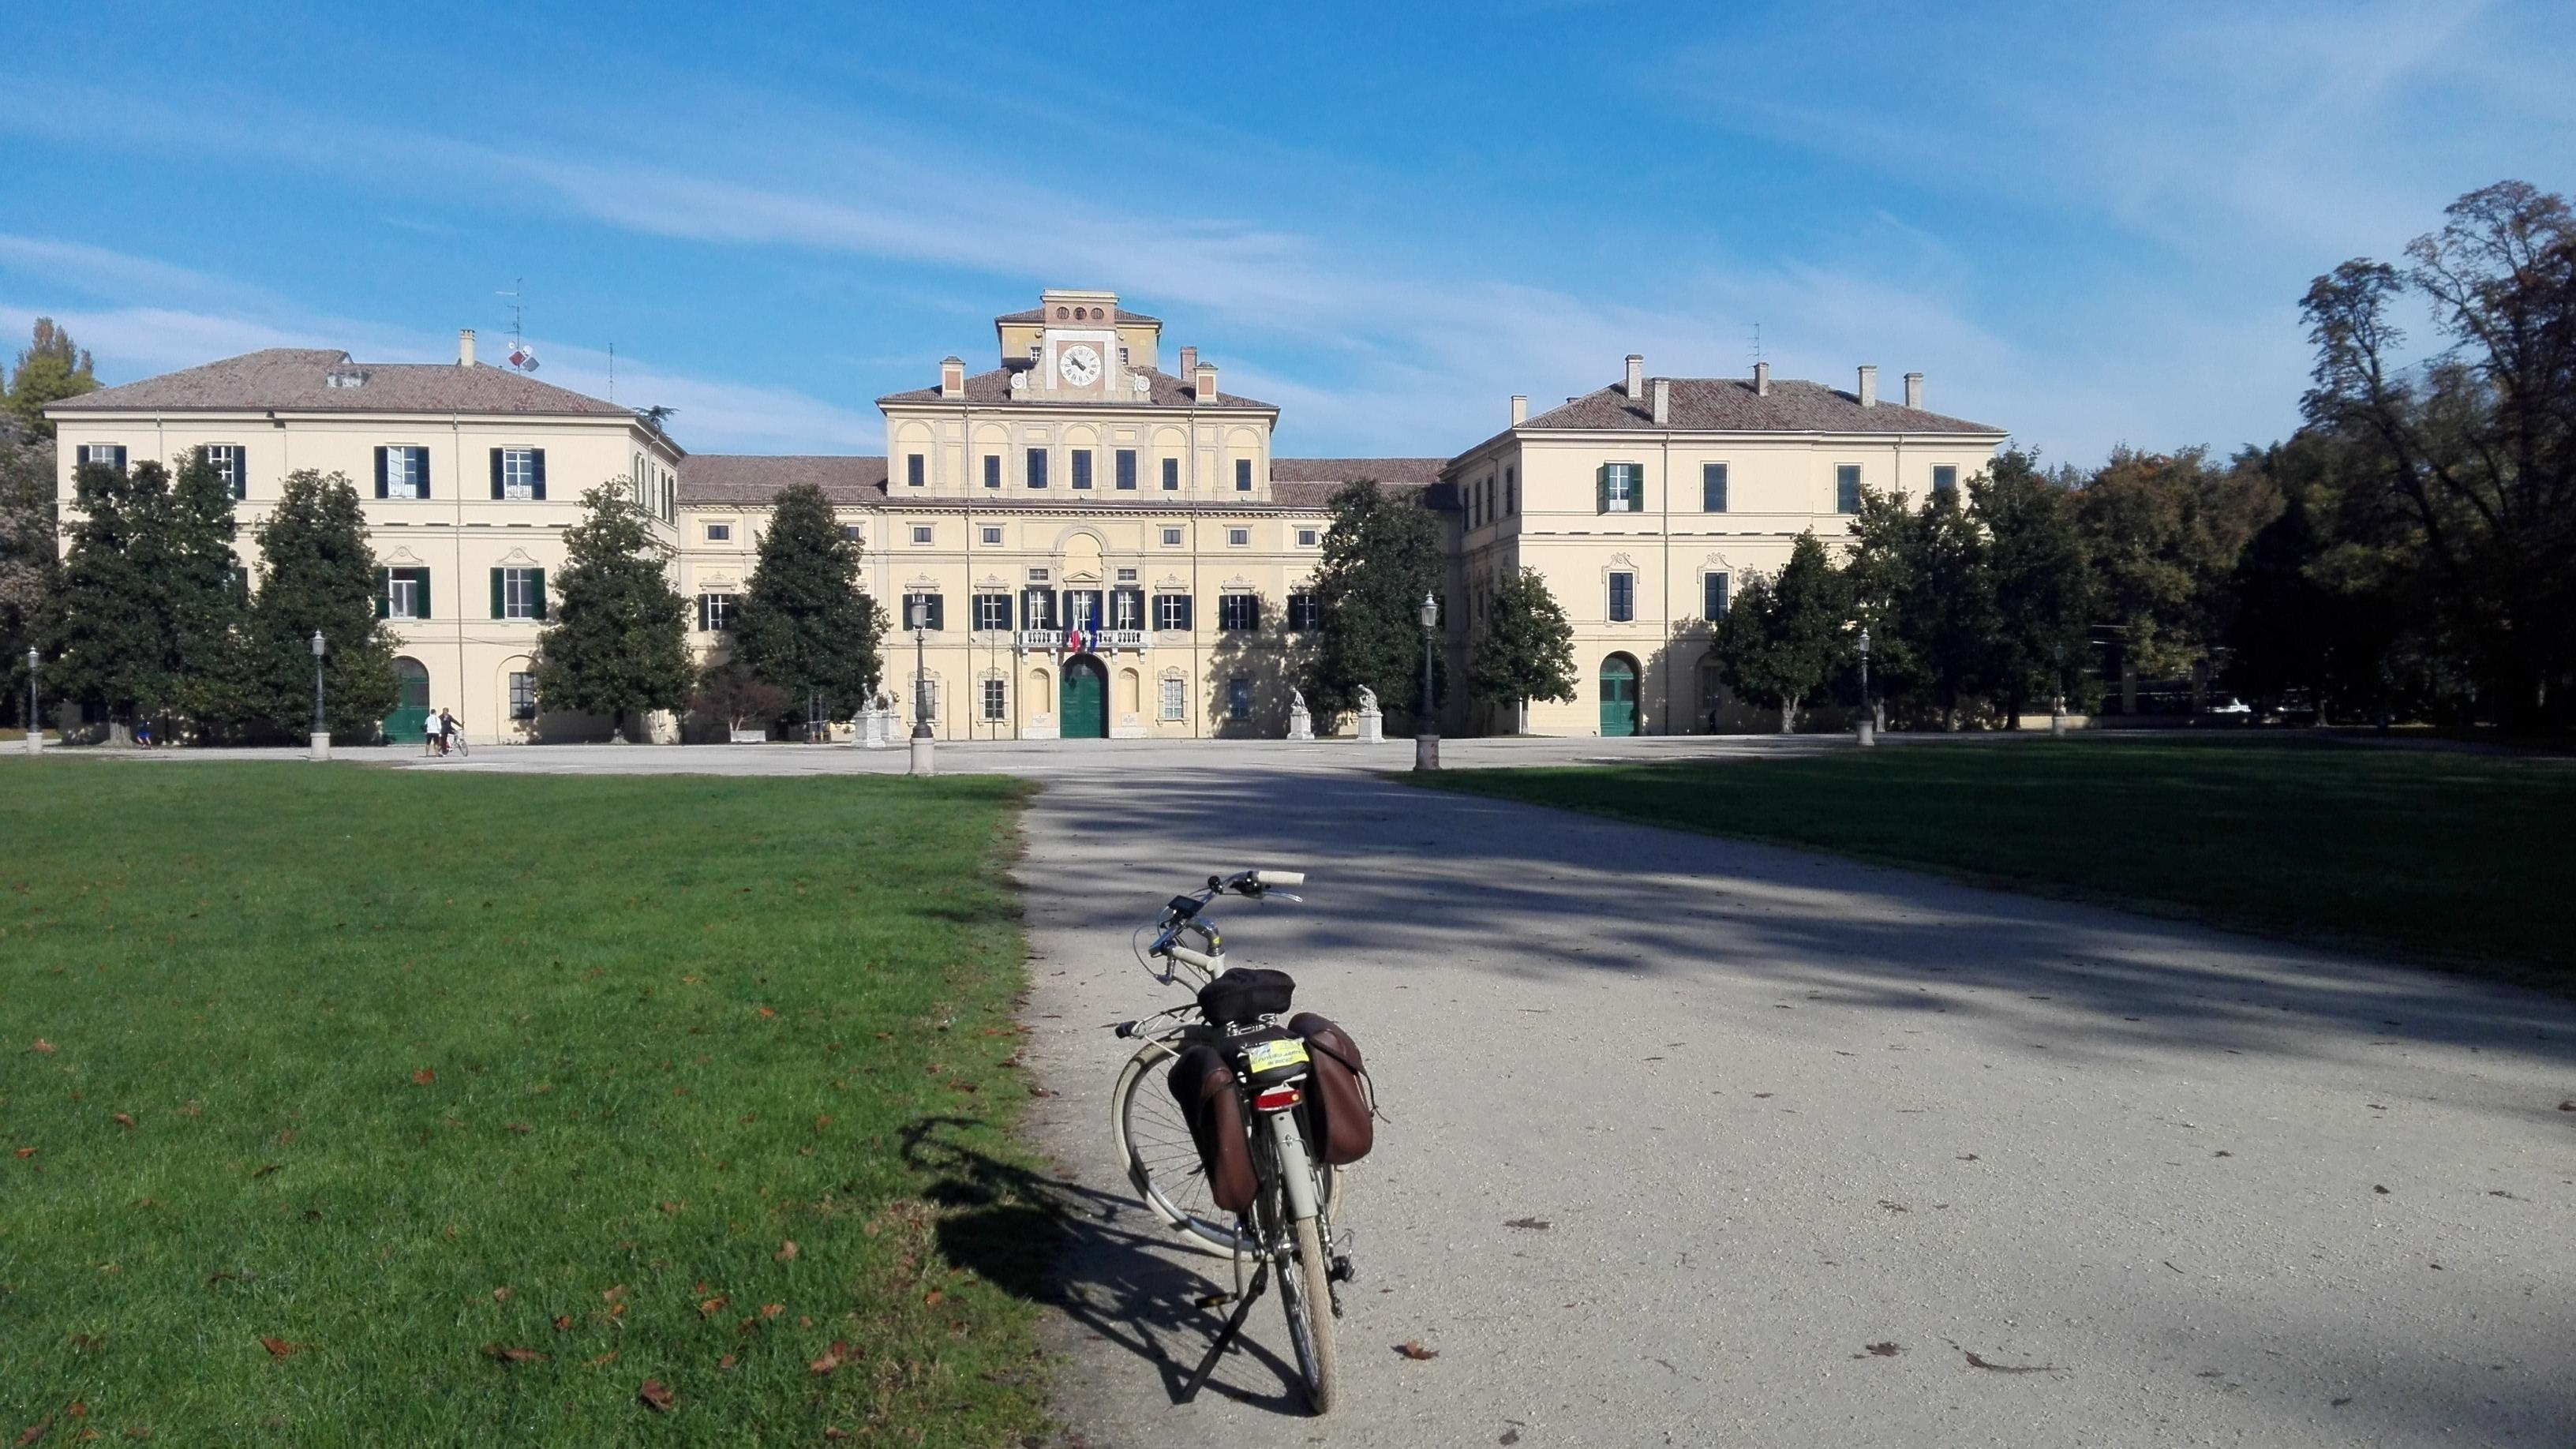 palazzo ducale parma2.jpg